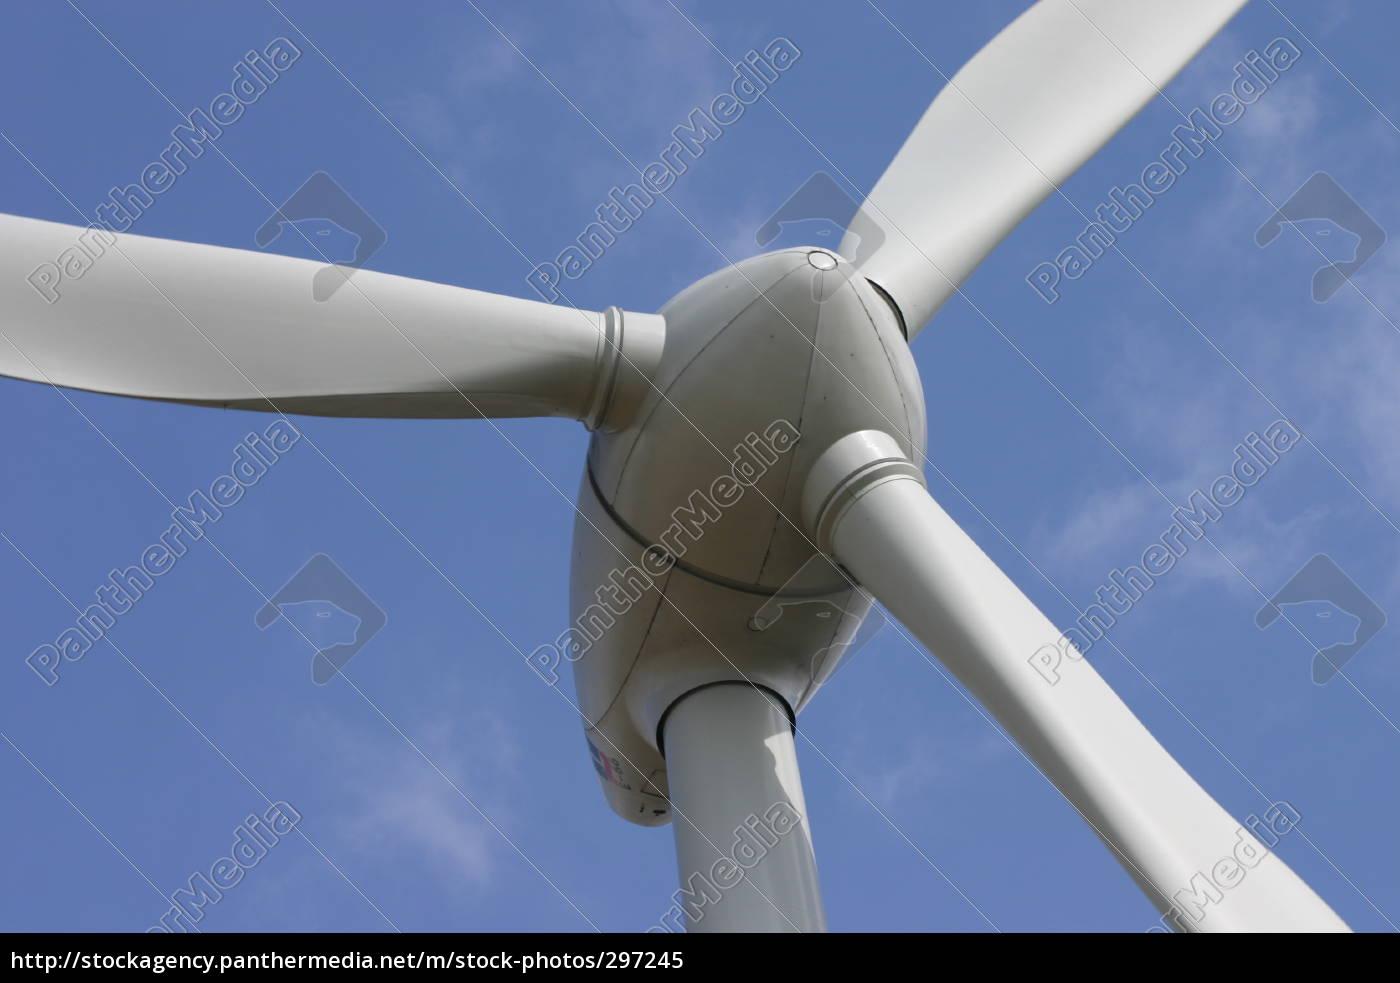 rotor - 297245